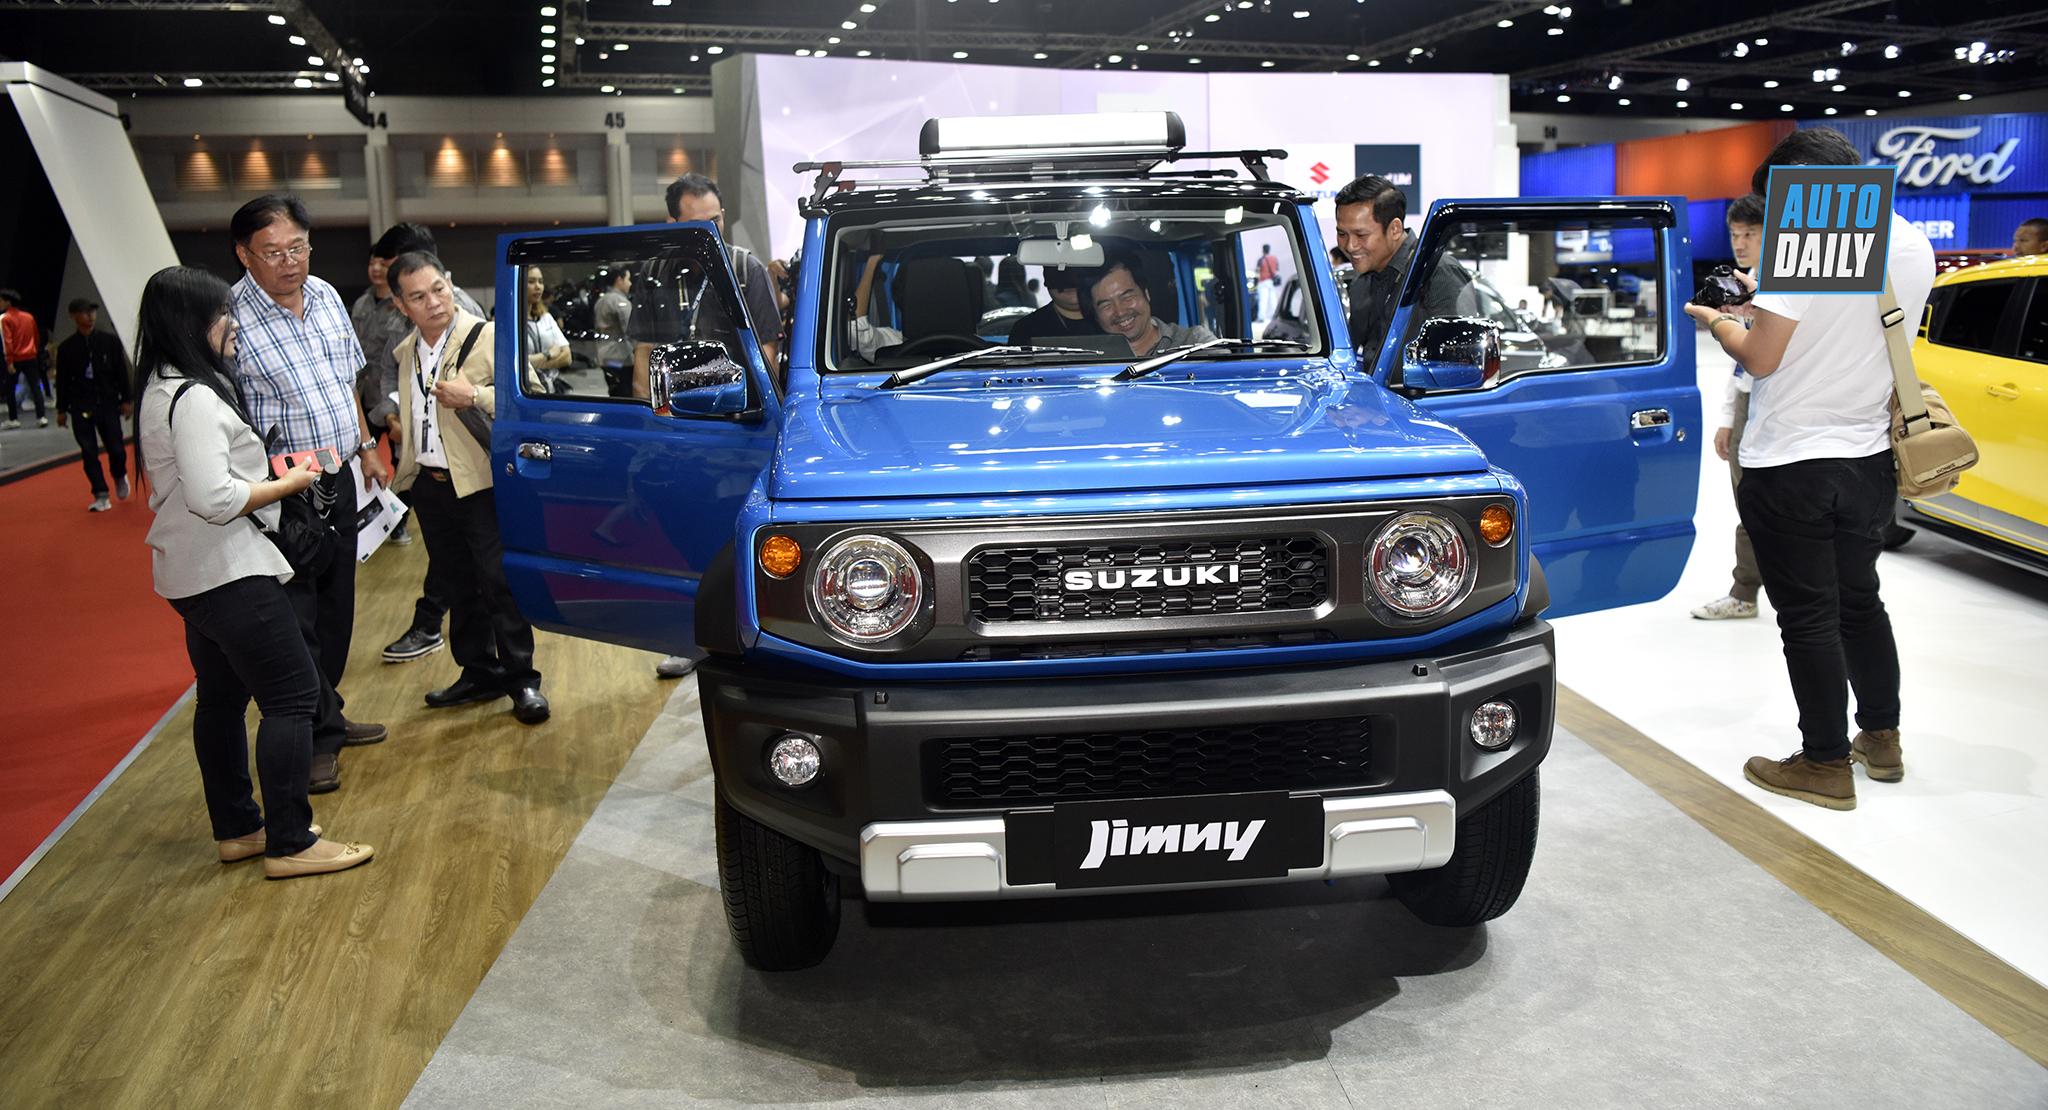 suzuki-jimny-bangkok-motor-show-autodaily-02.jpg